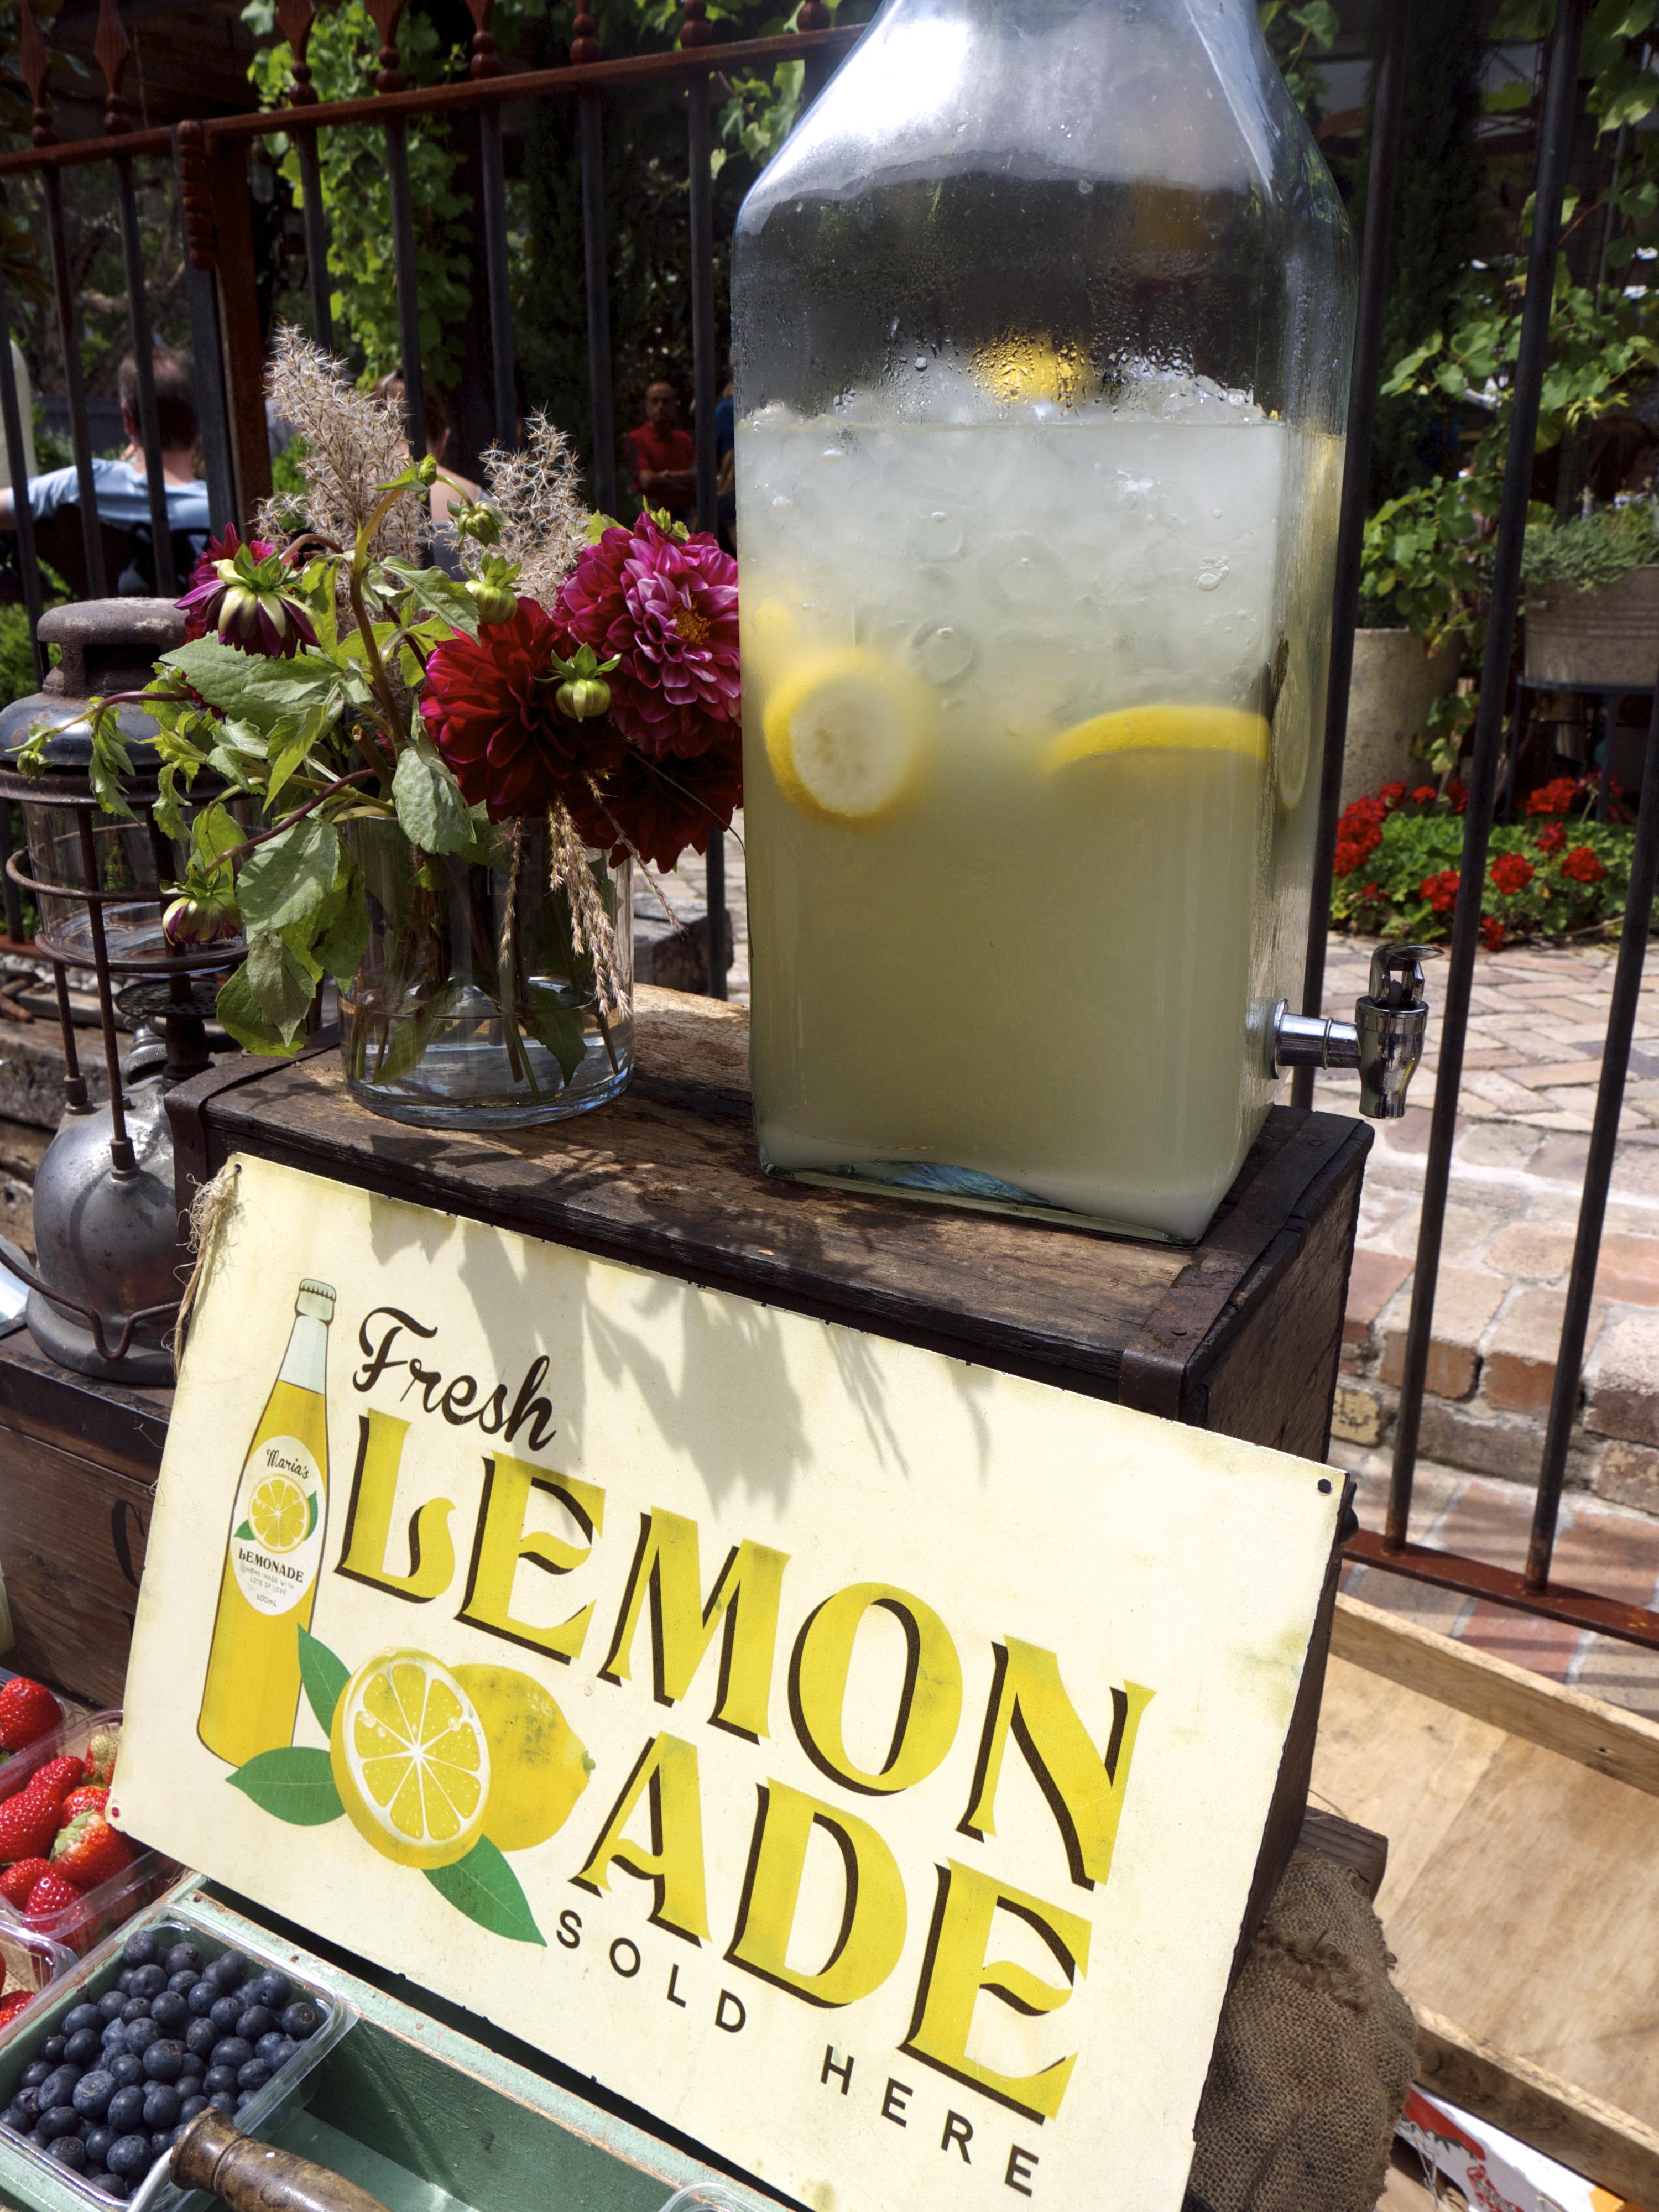 The Grounds of Alexandria - Fresh Lemonade Stand